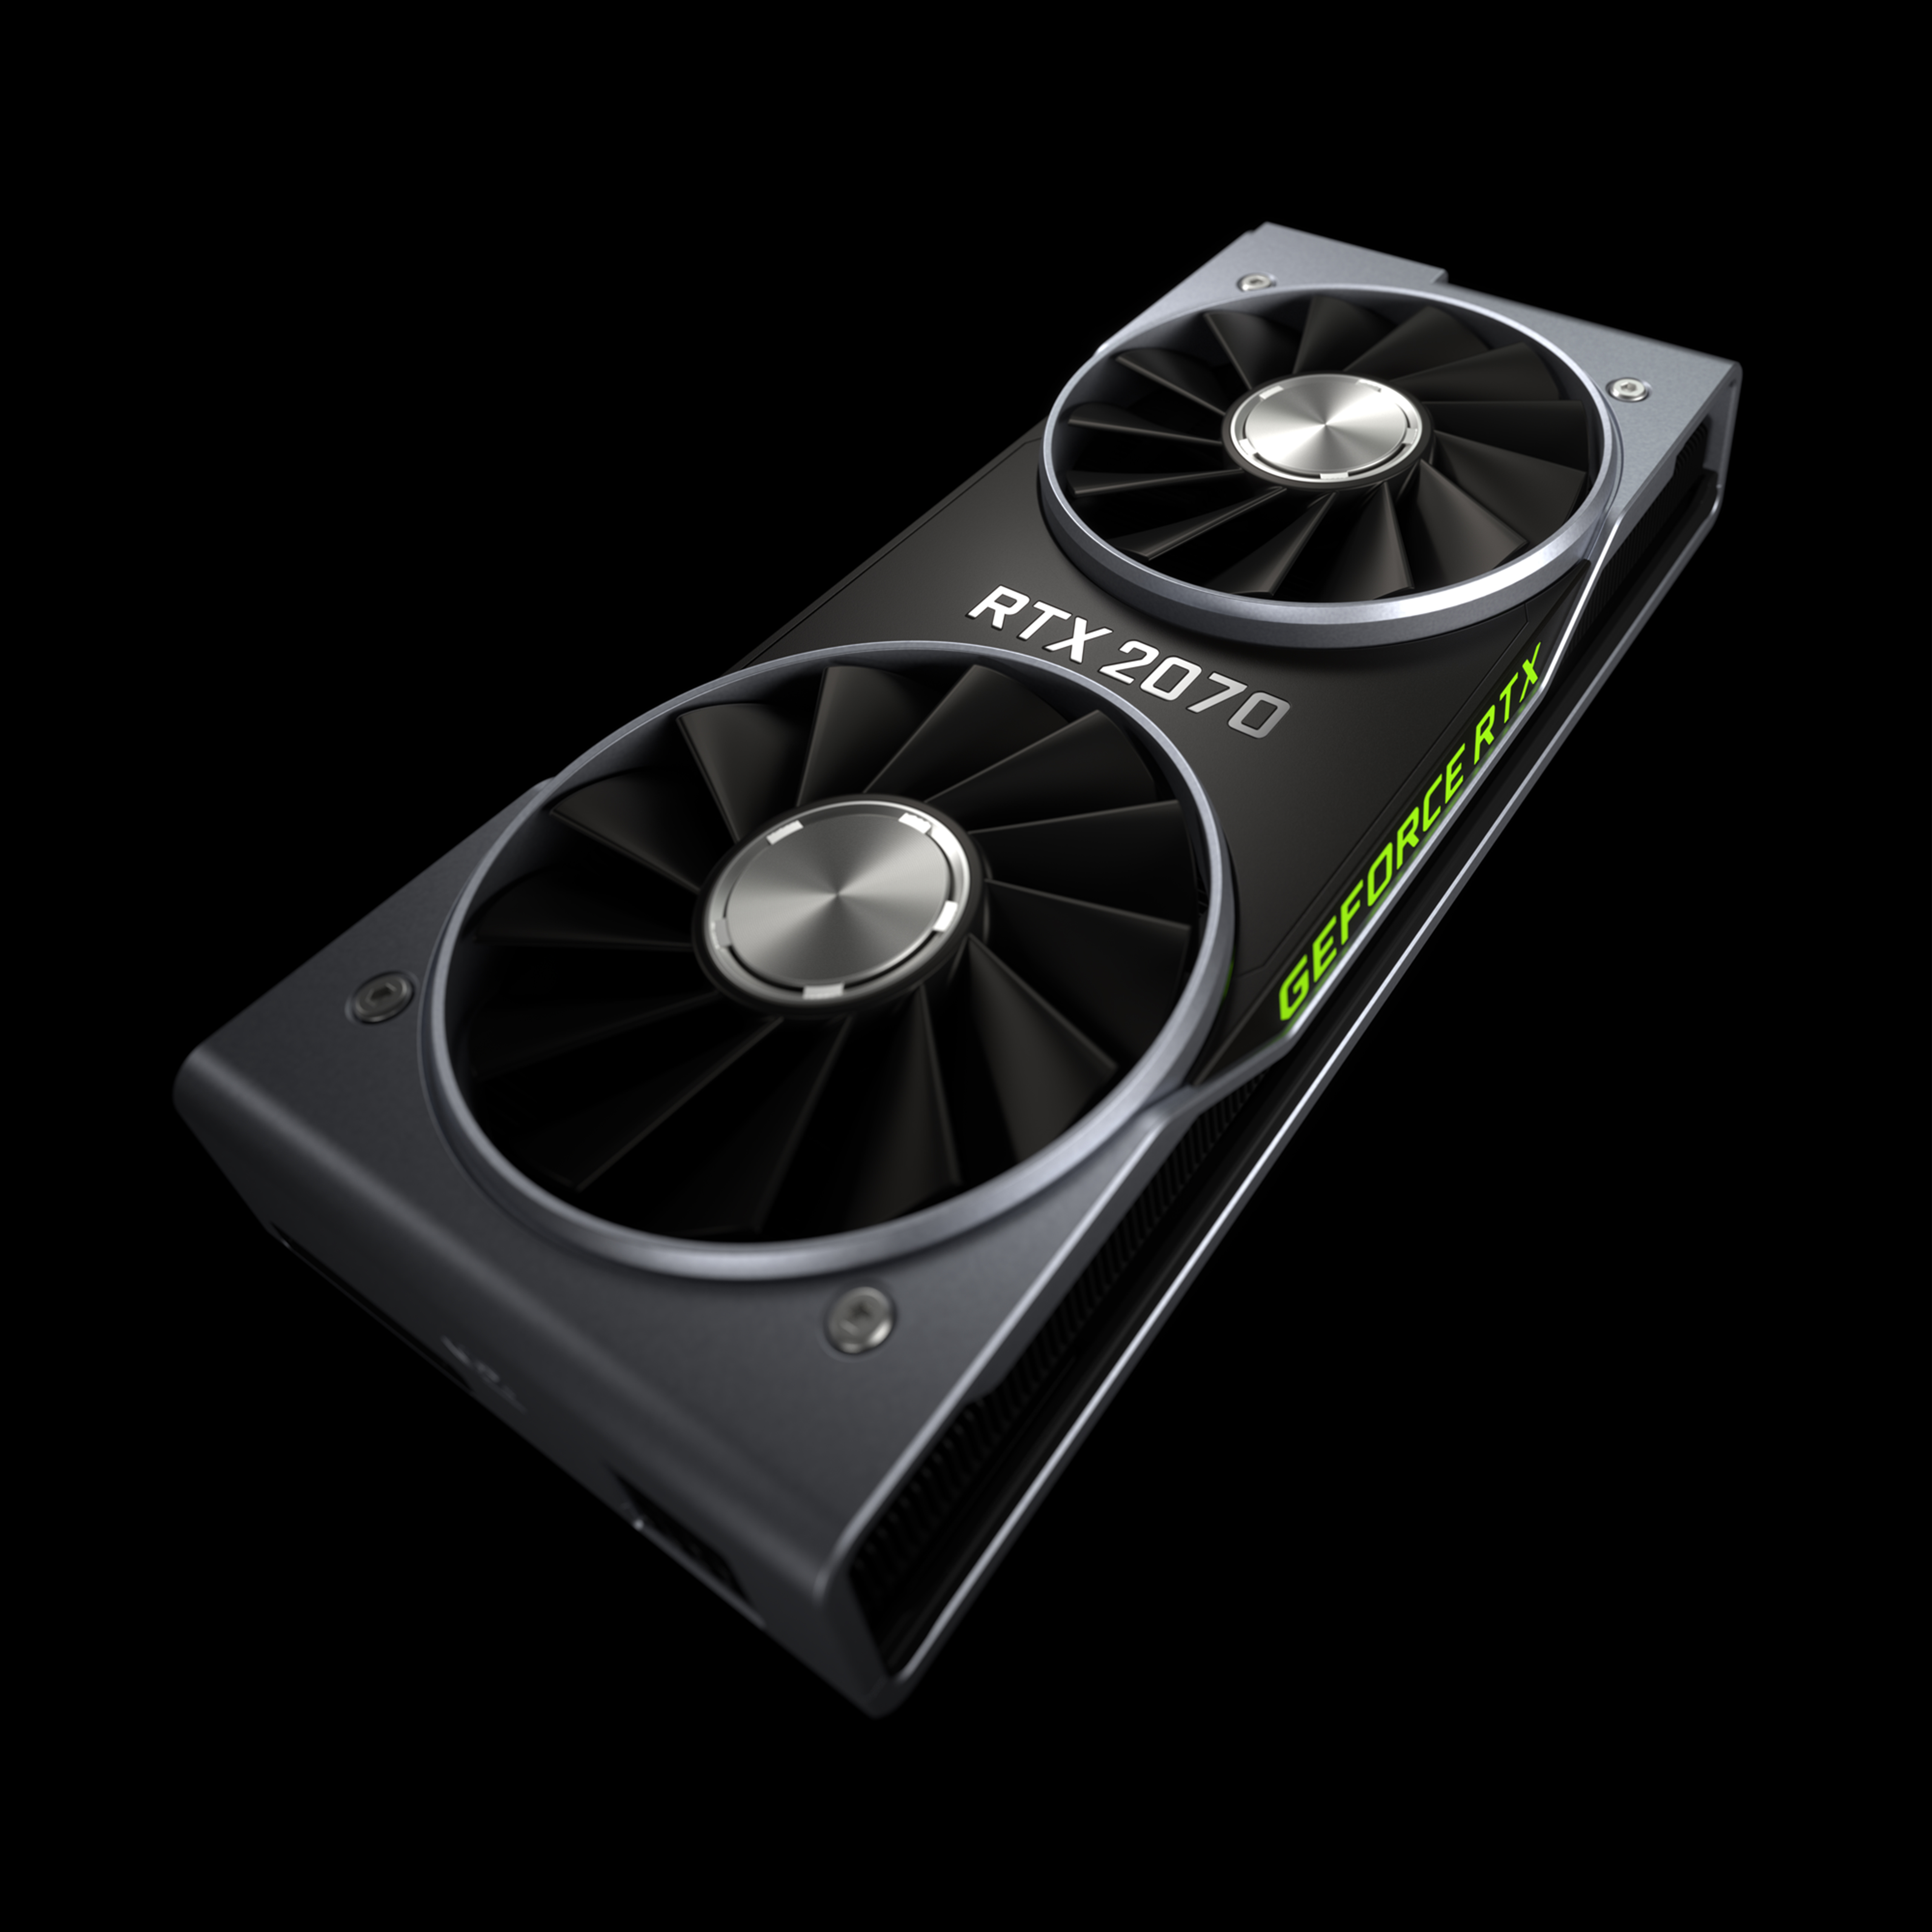 GeForce RTX 2070 Graphics Card | NVIDIA